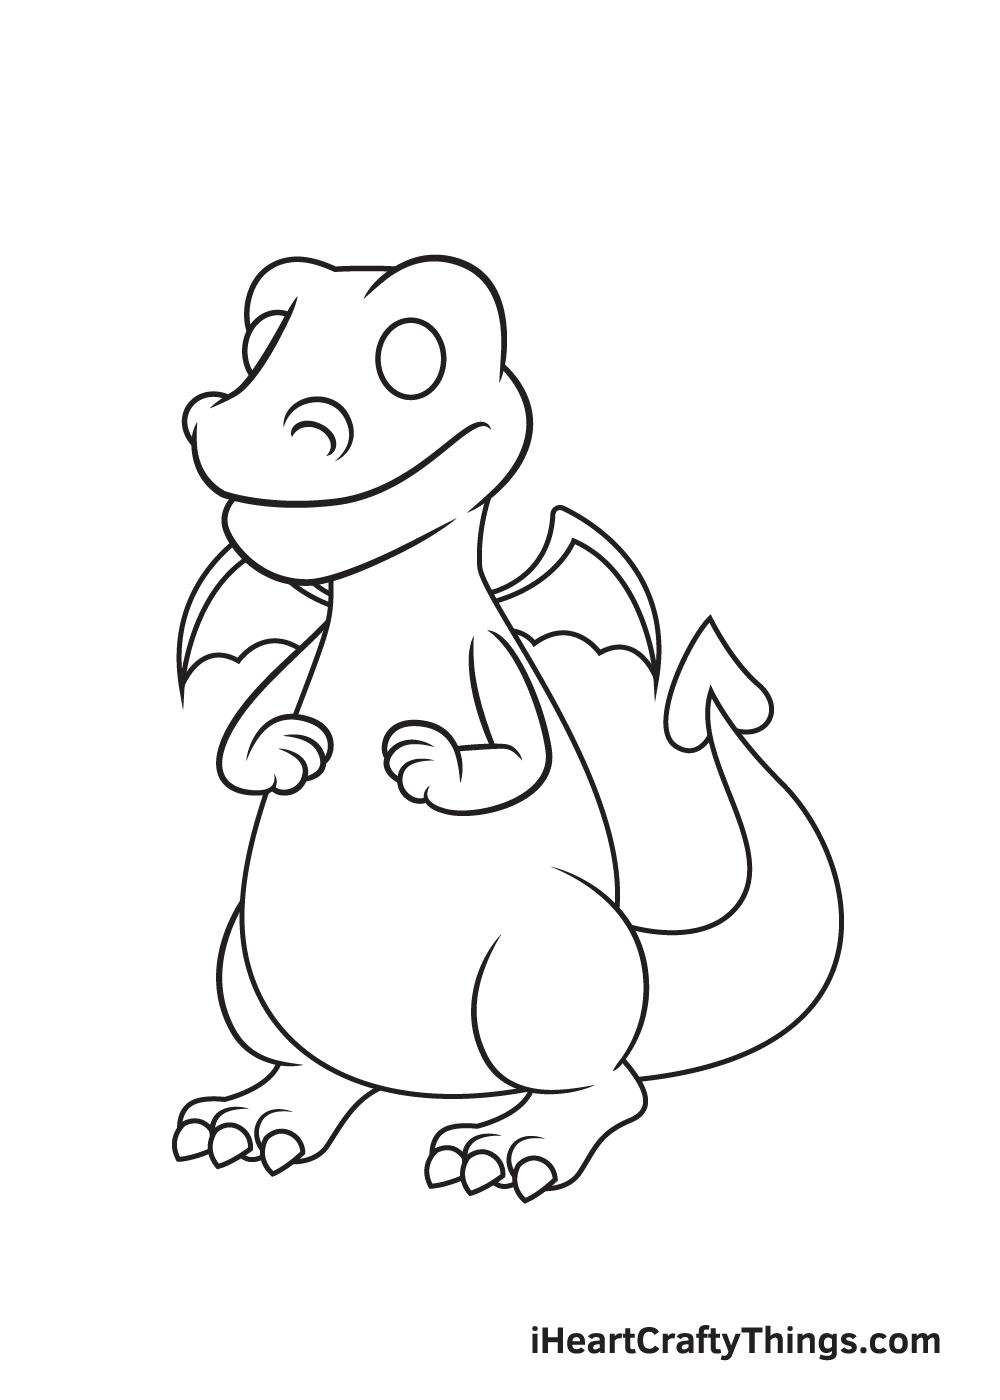 Dragon Drawing – Step 6